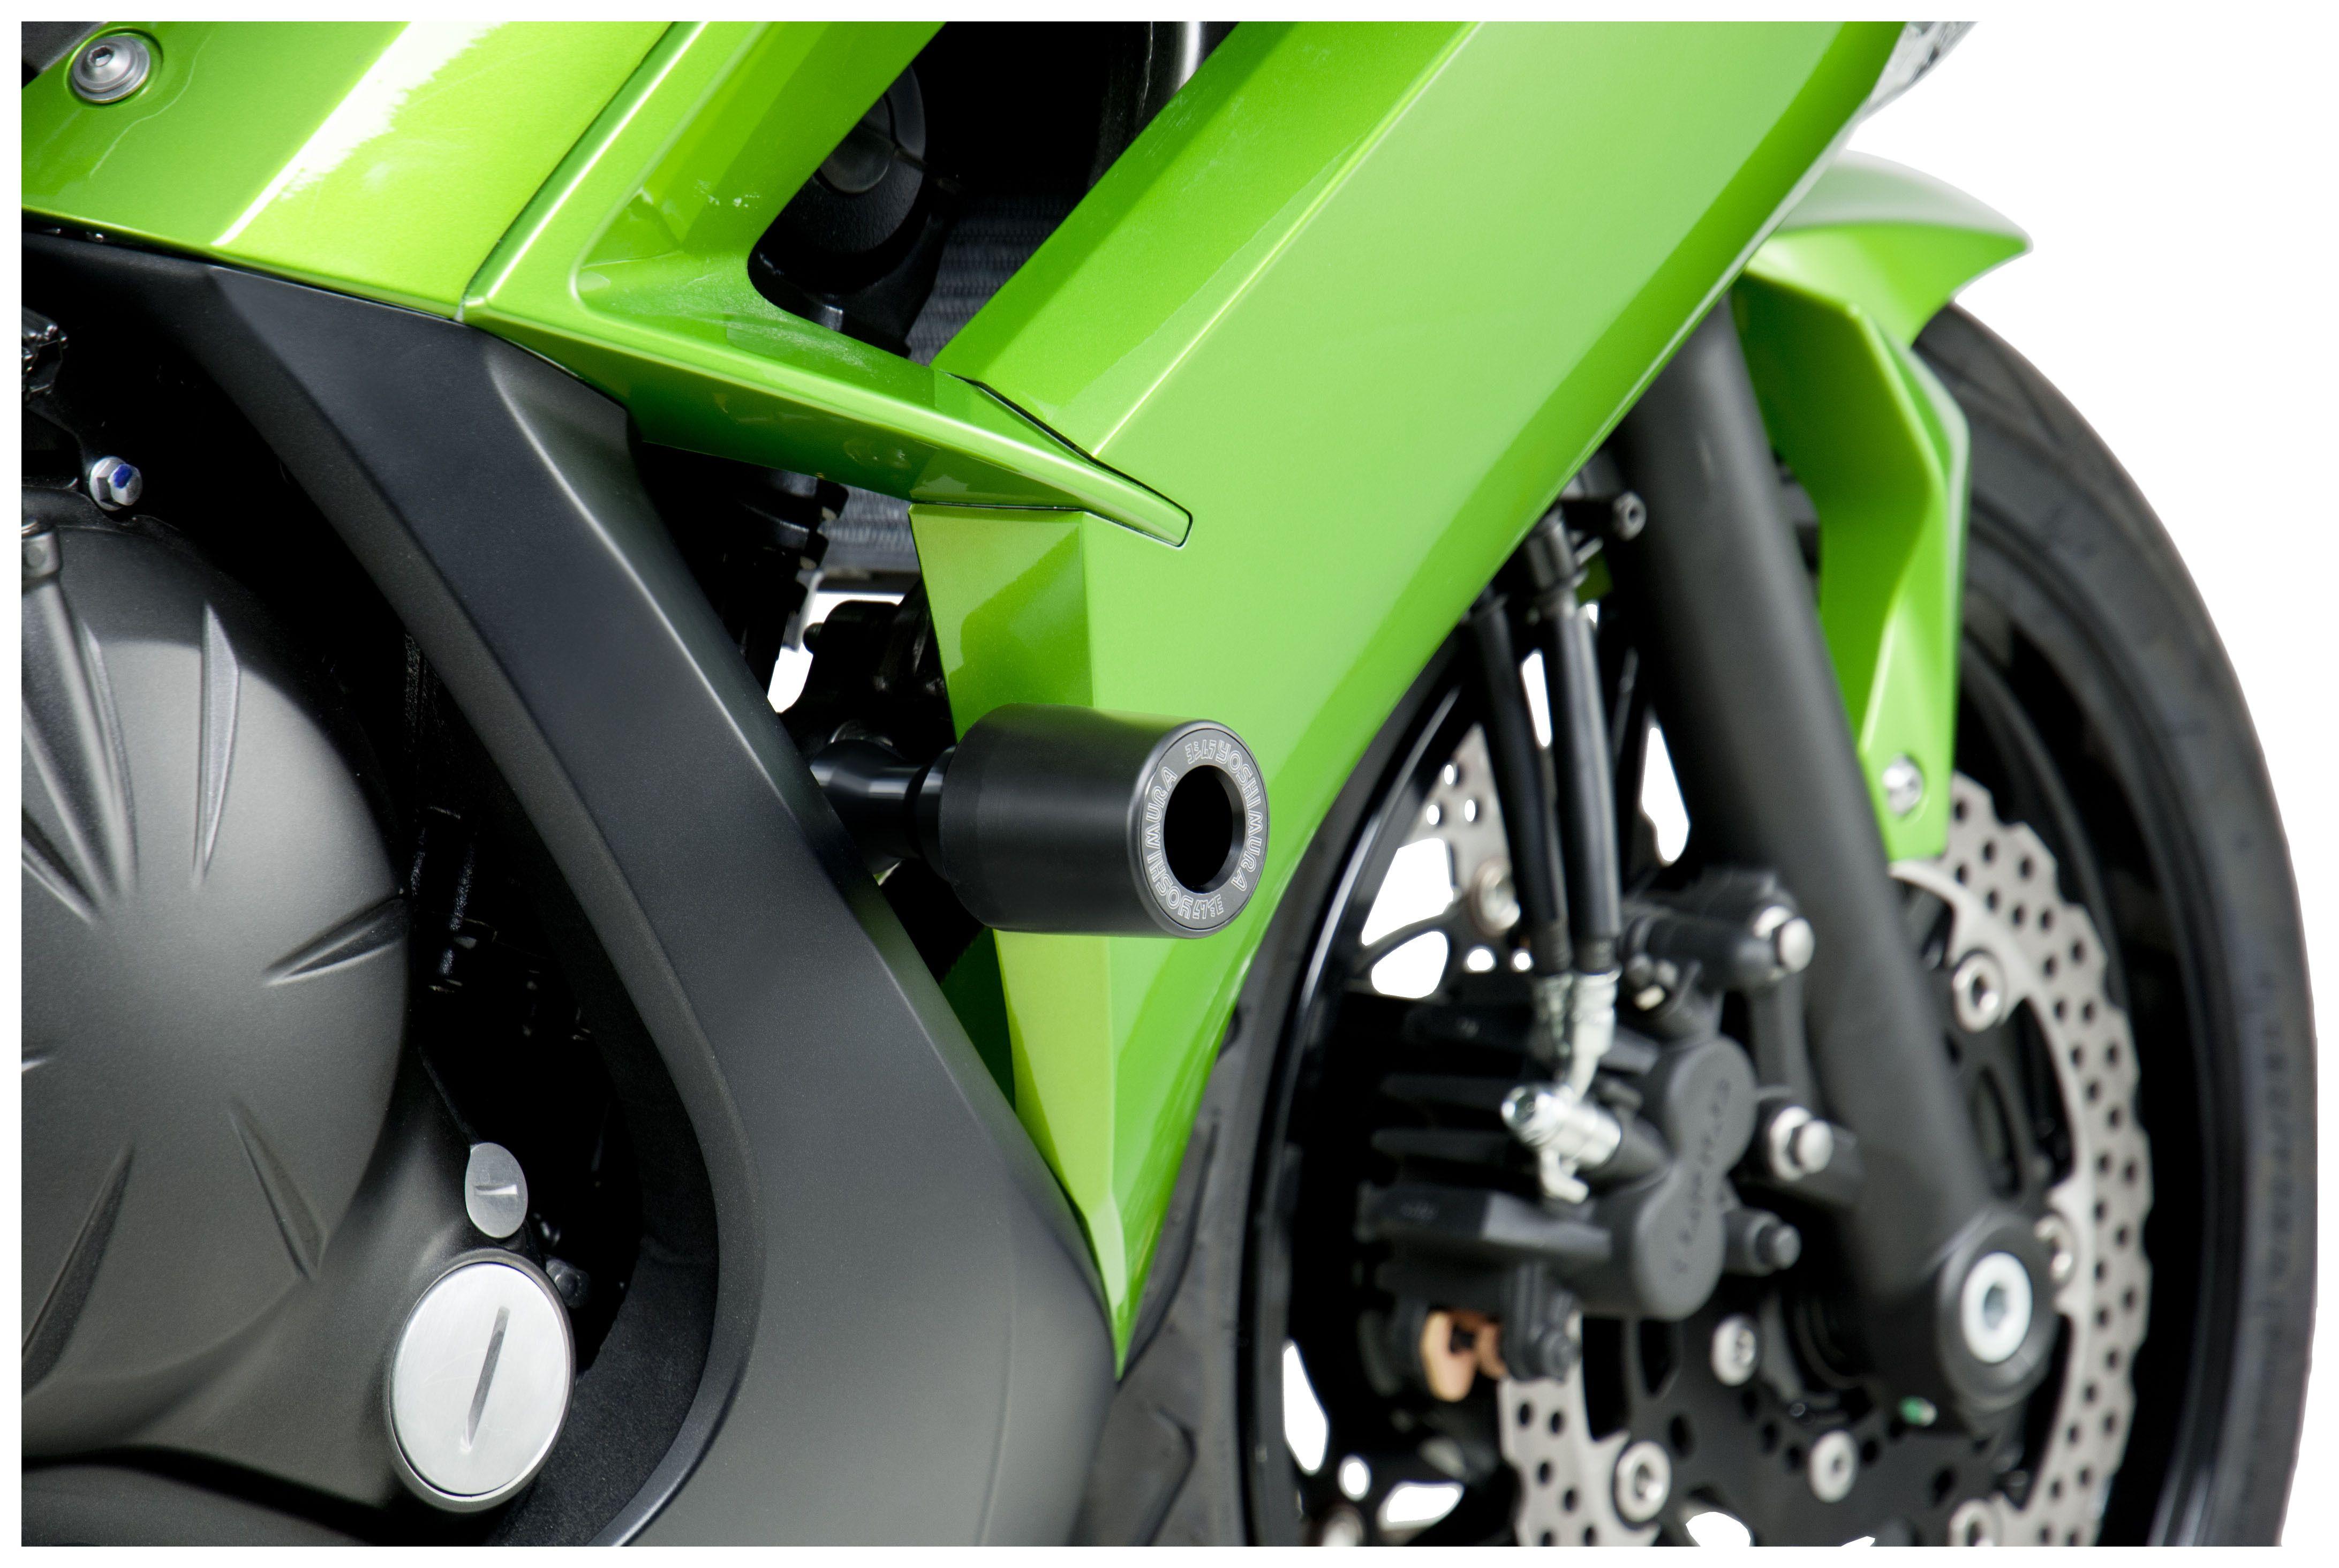 Yoshimura Frame Sliders Kawasaki Ninja 650 2012-2016 - Cycle Gear